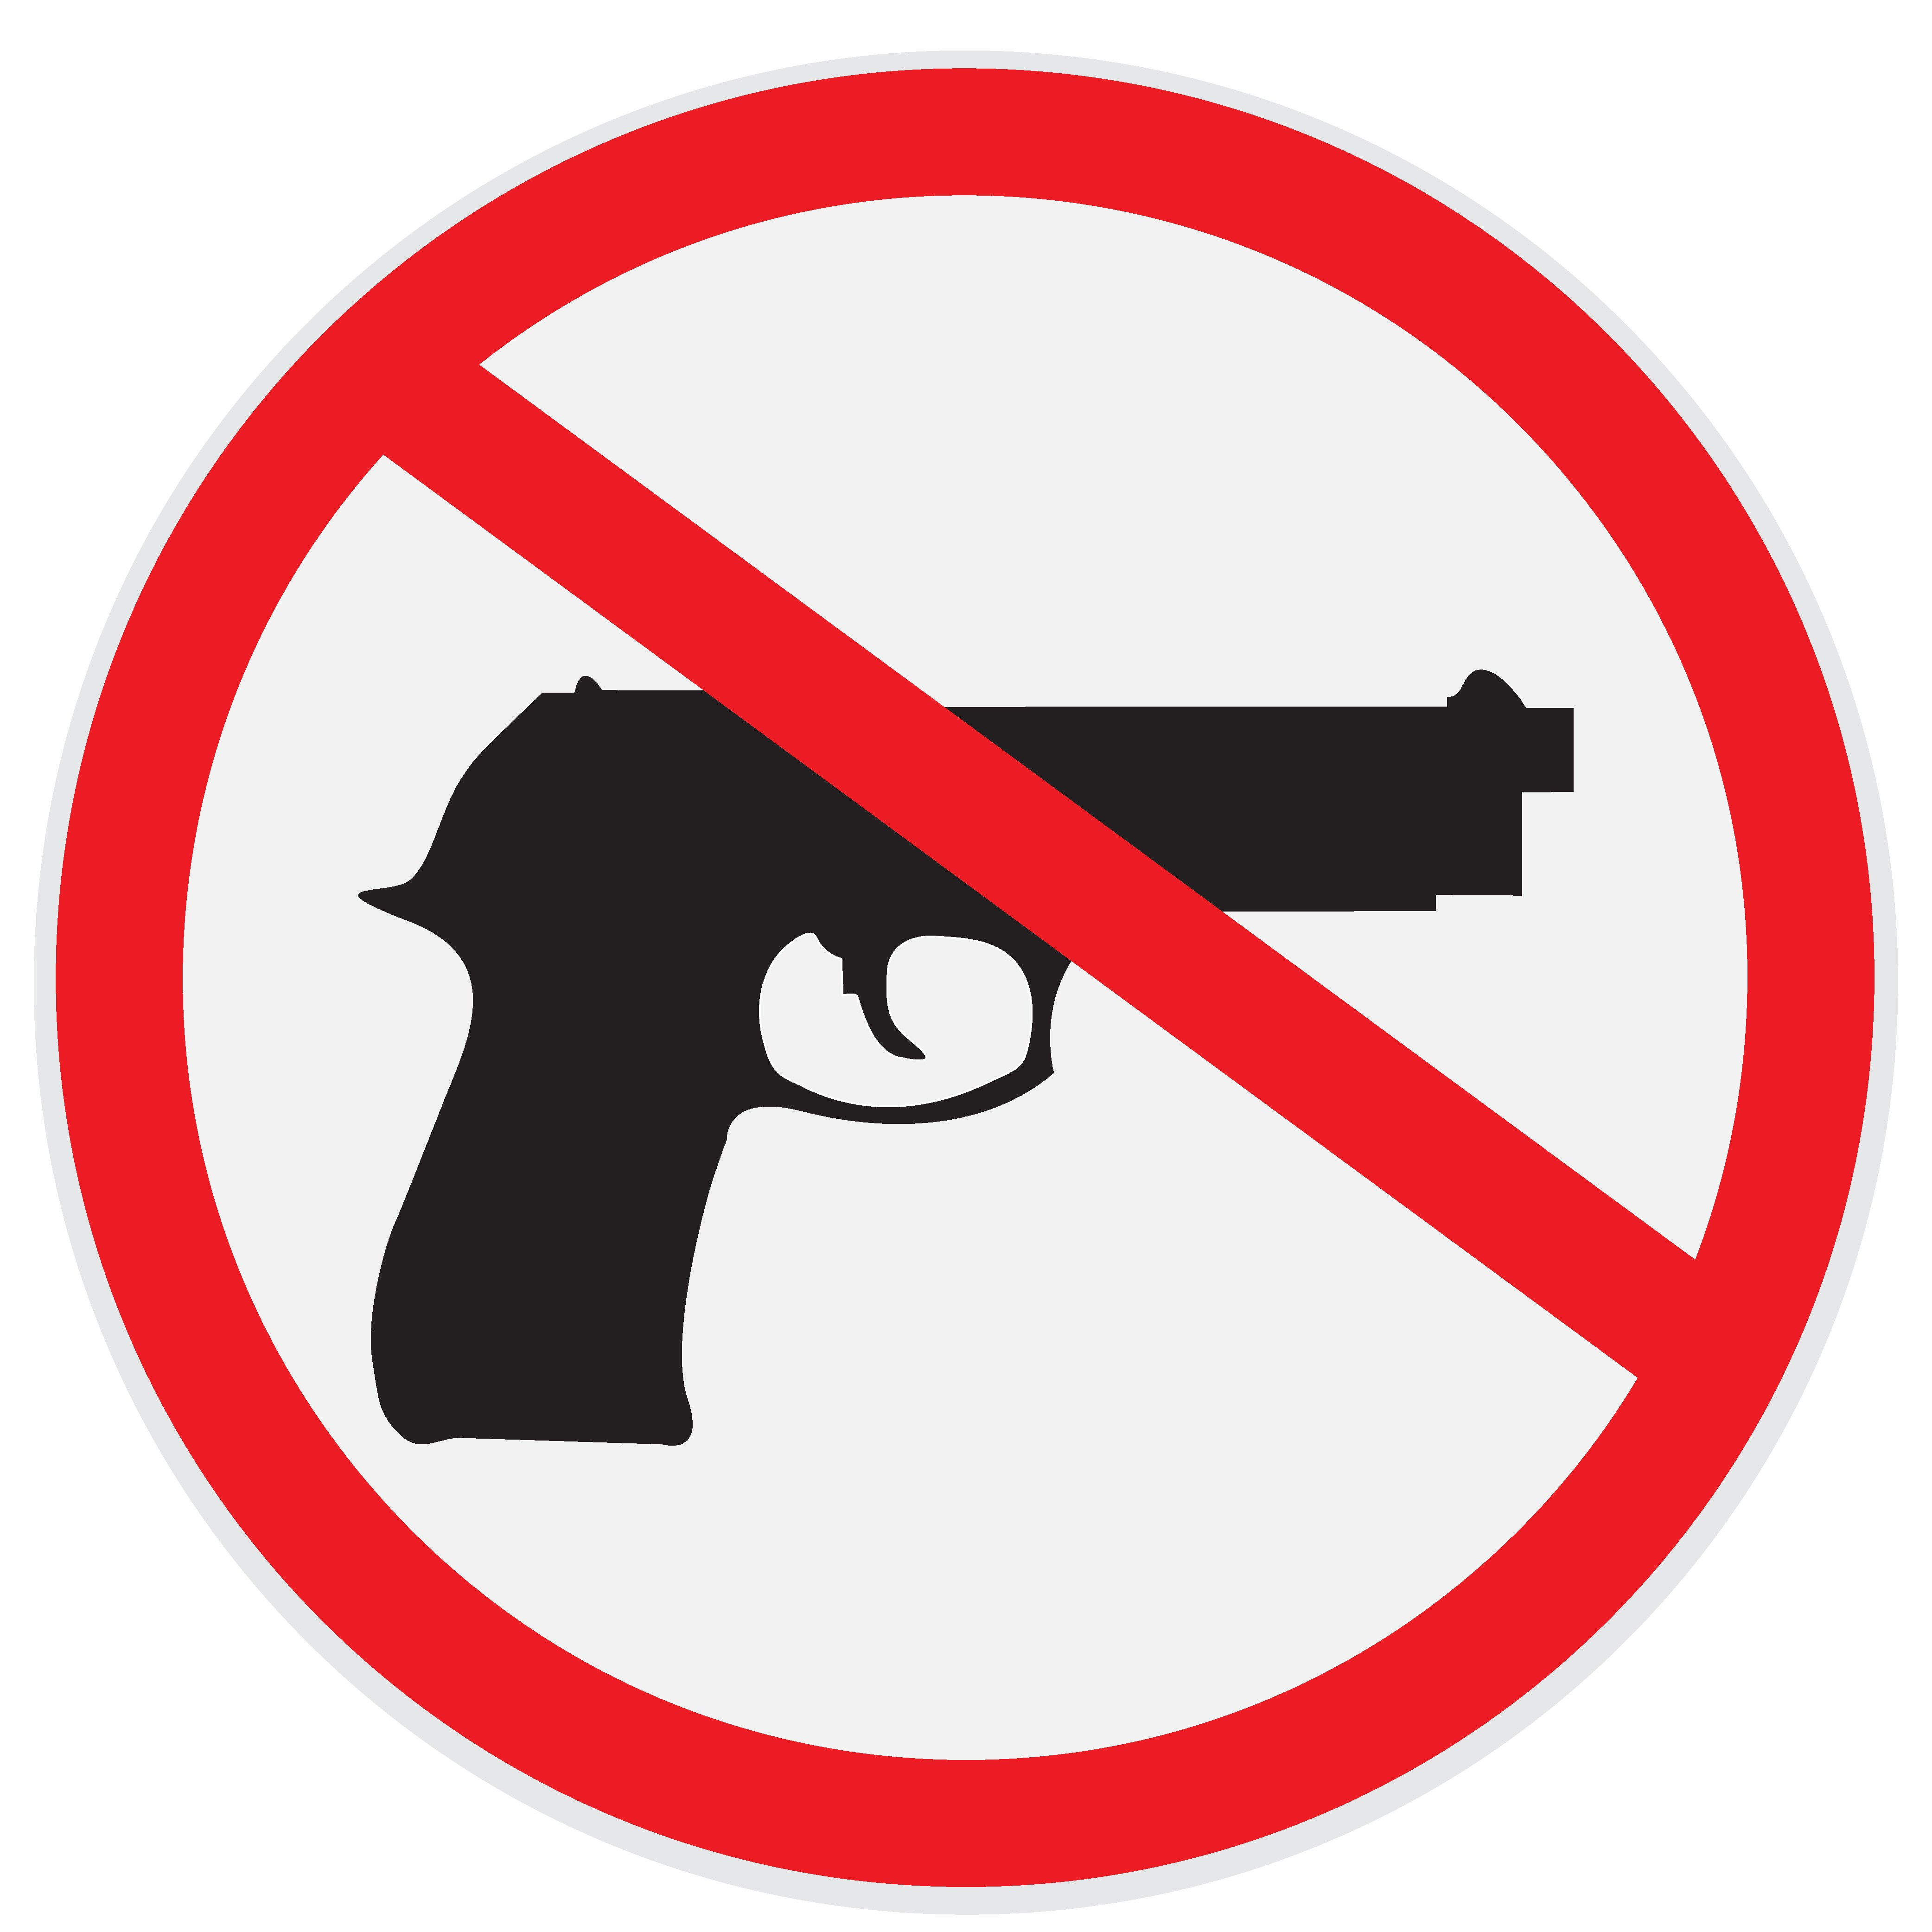 Combating hamilton rn turns. Clipart gun gun violence